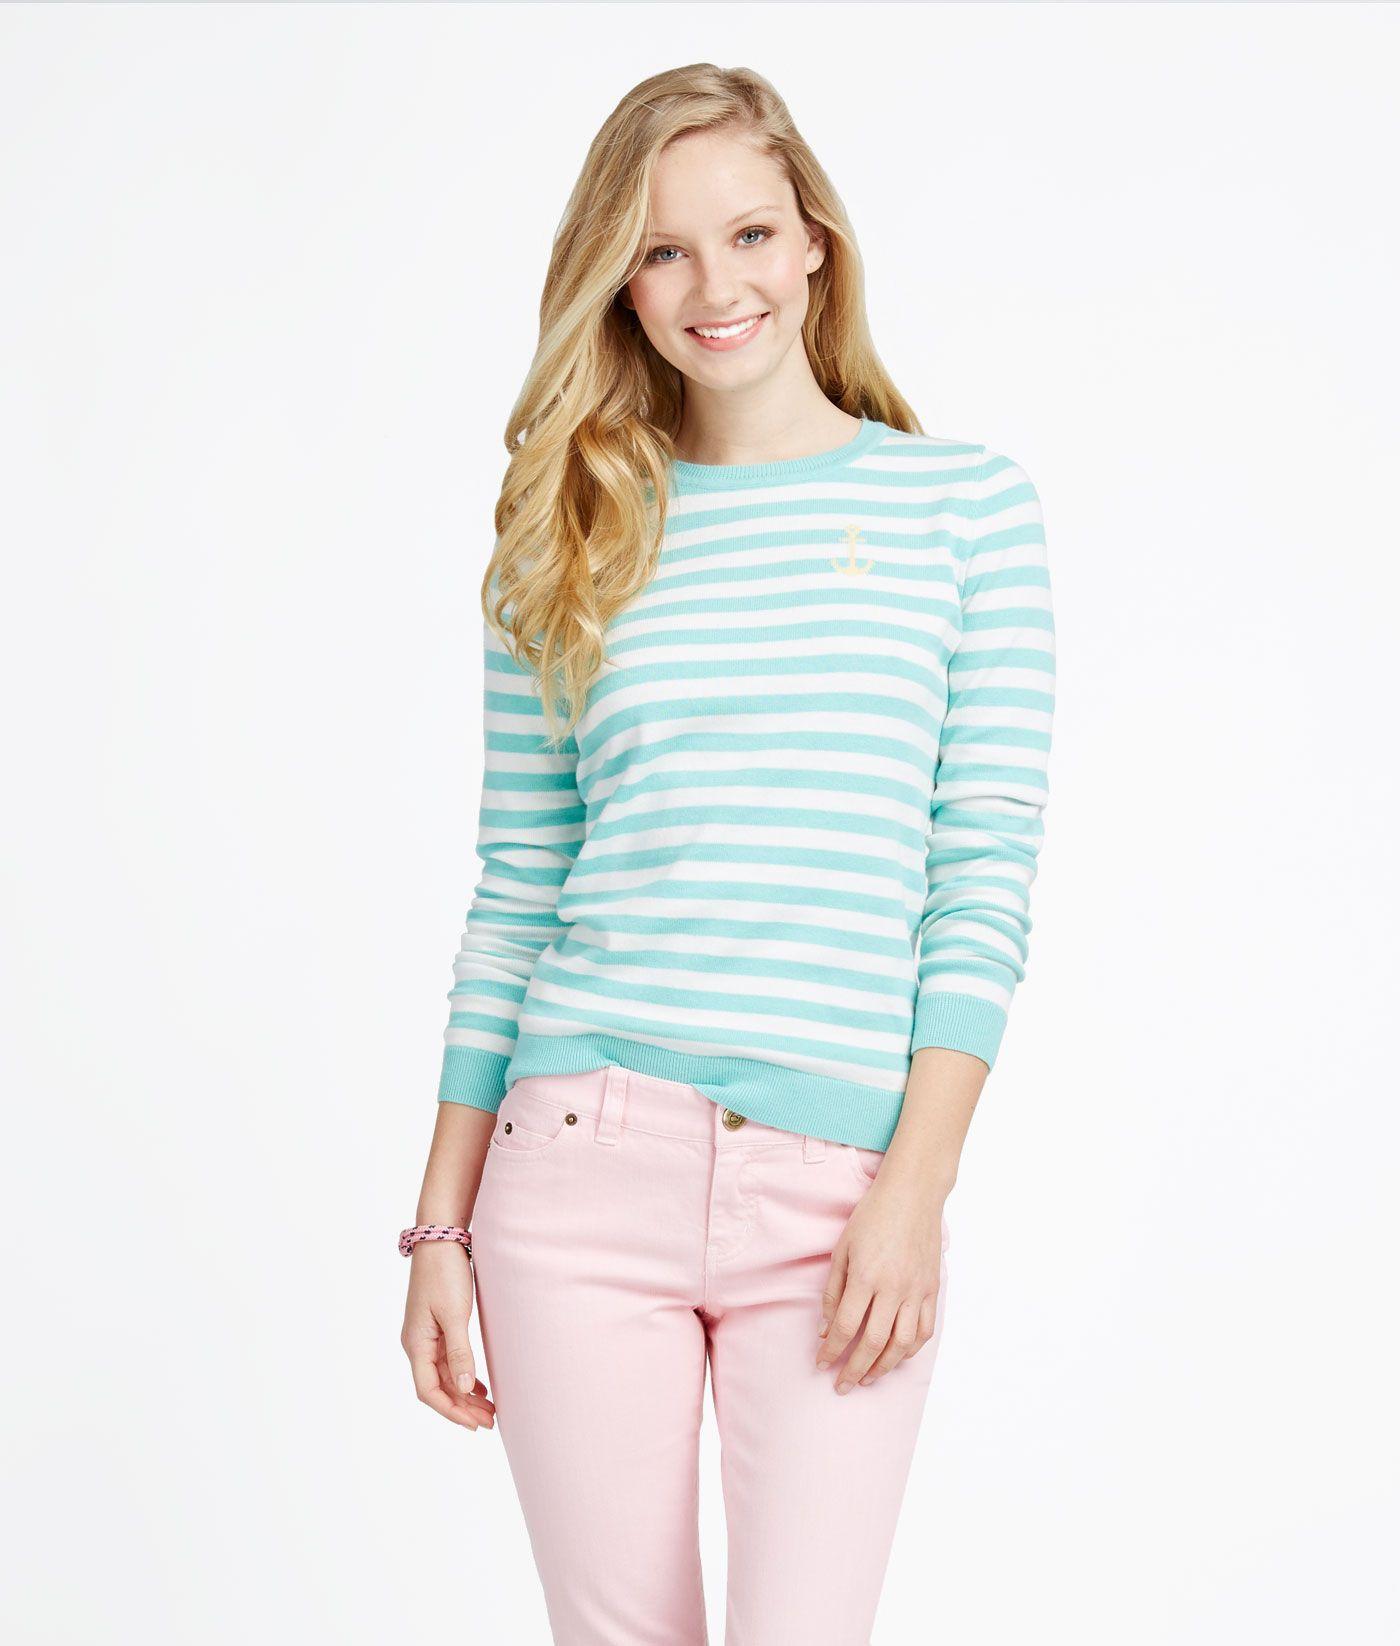 Women's Sweater: Shop Spring Stripe Intarsia Sweaters | Vineyard ...